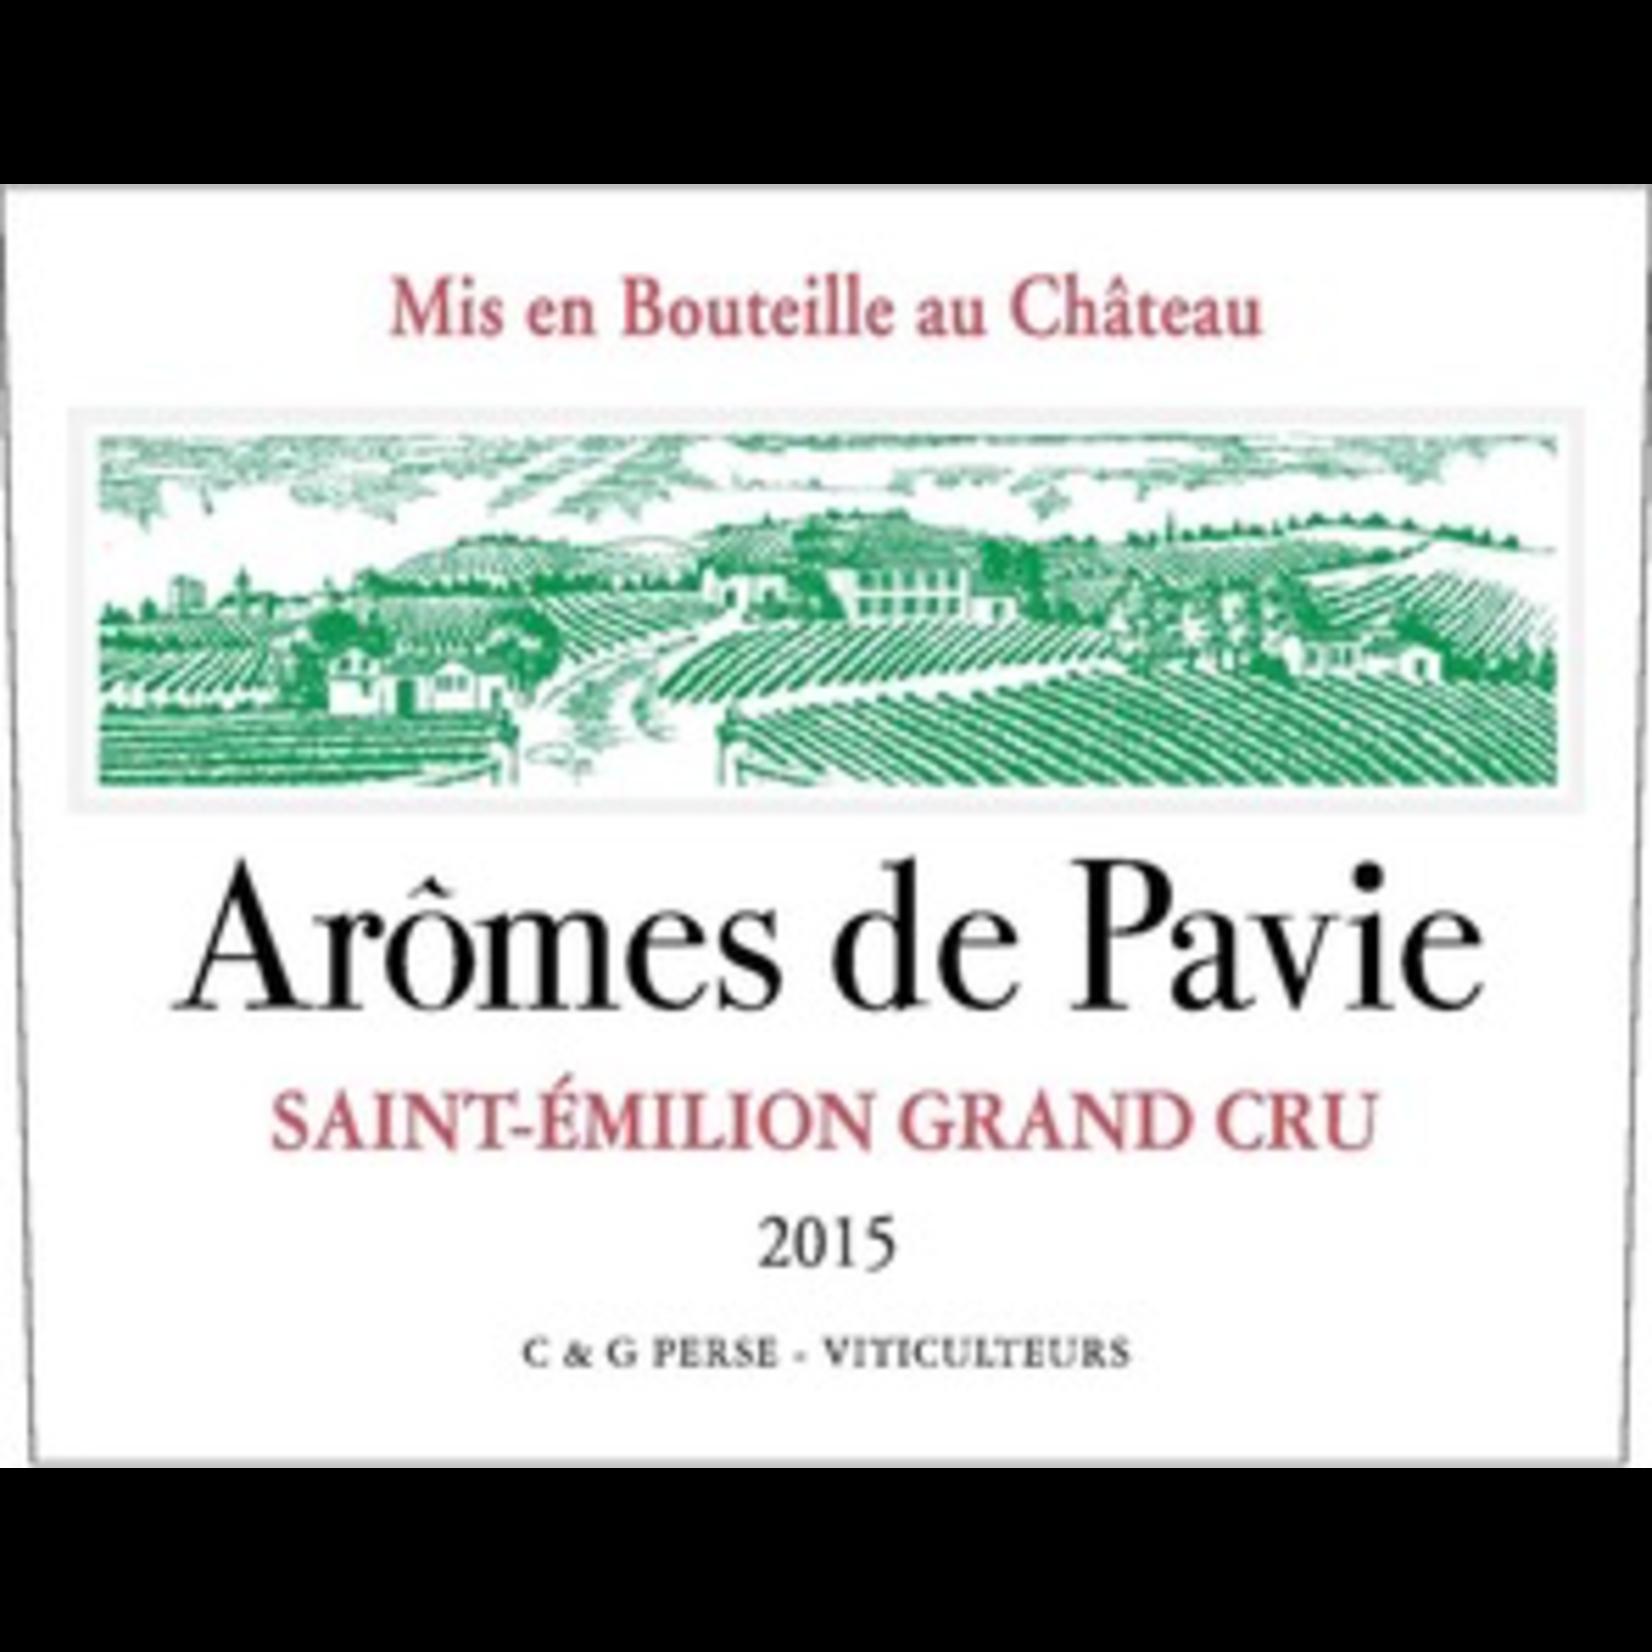 Wine Chateau Aromes de Pavie, Saint-Emilion Grand Cru 2016 375ml